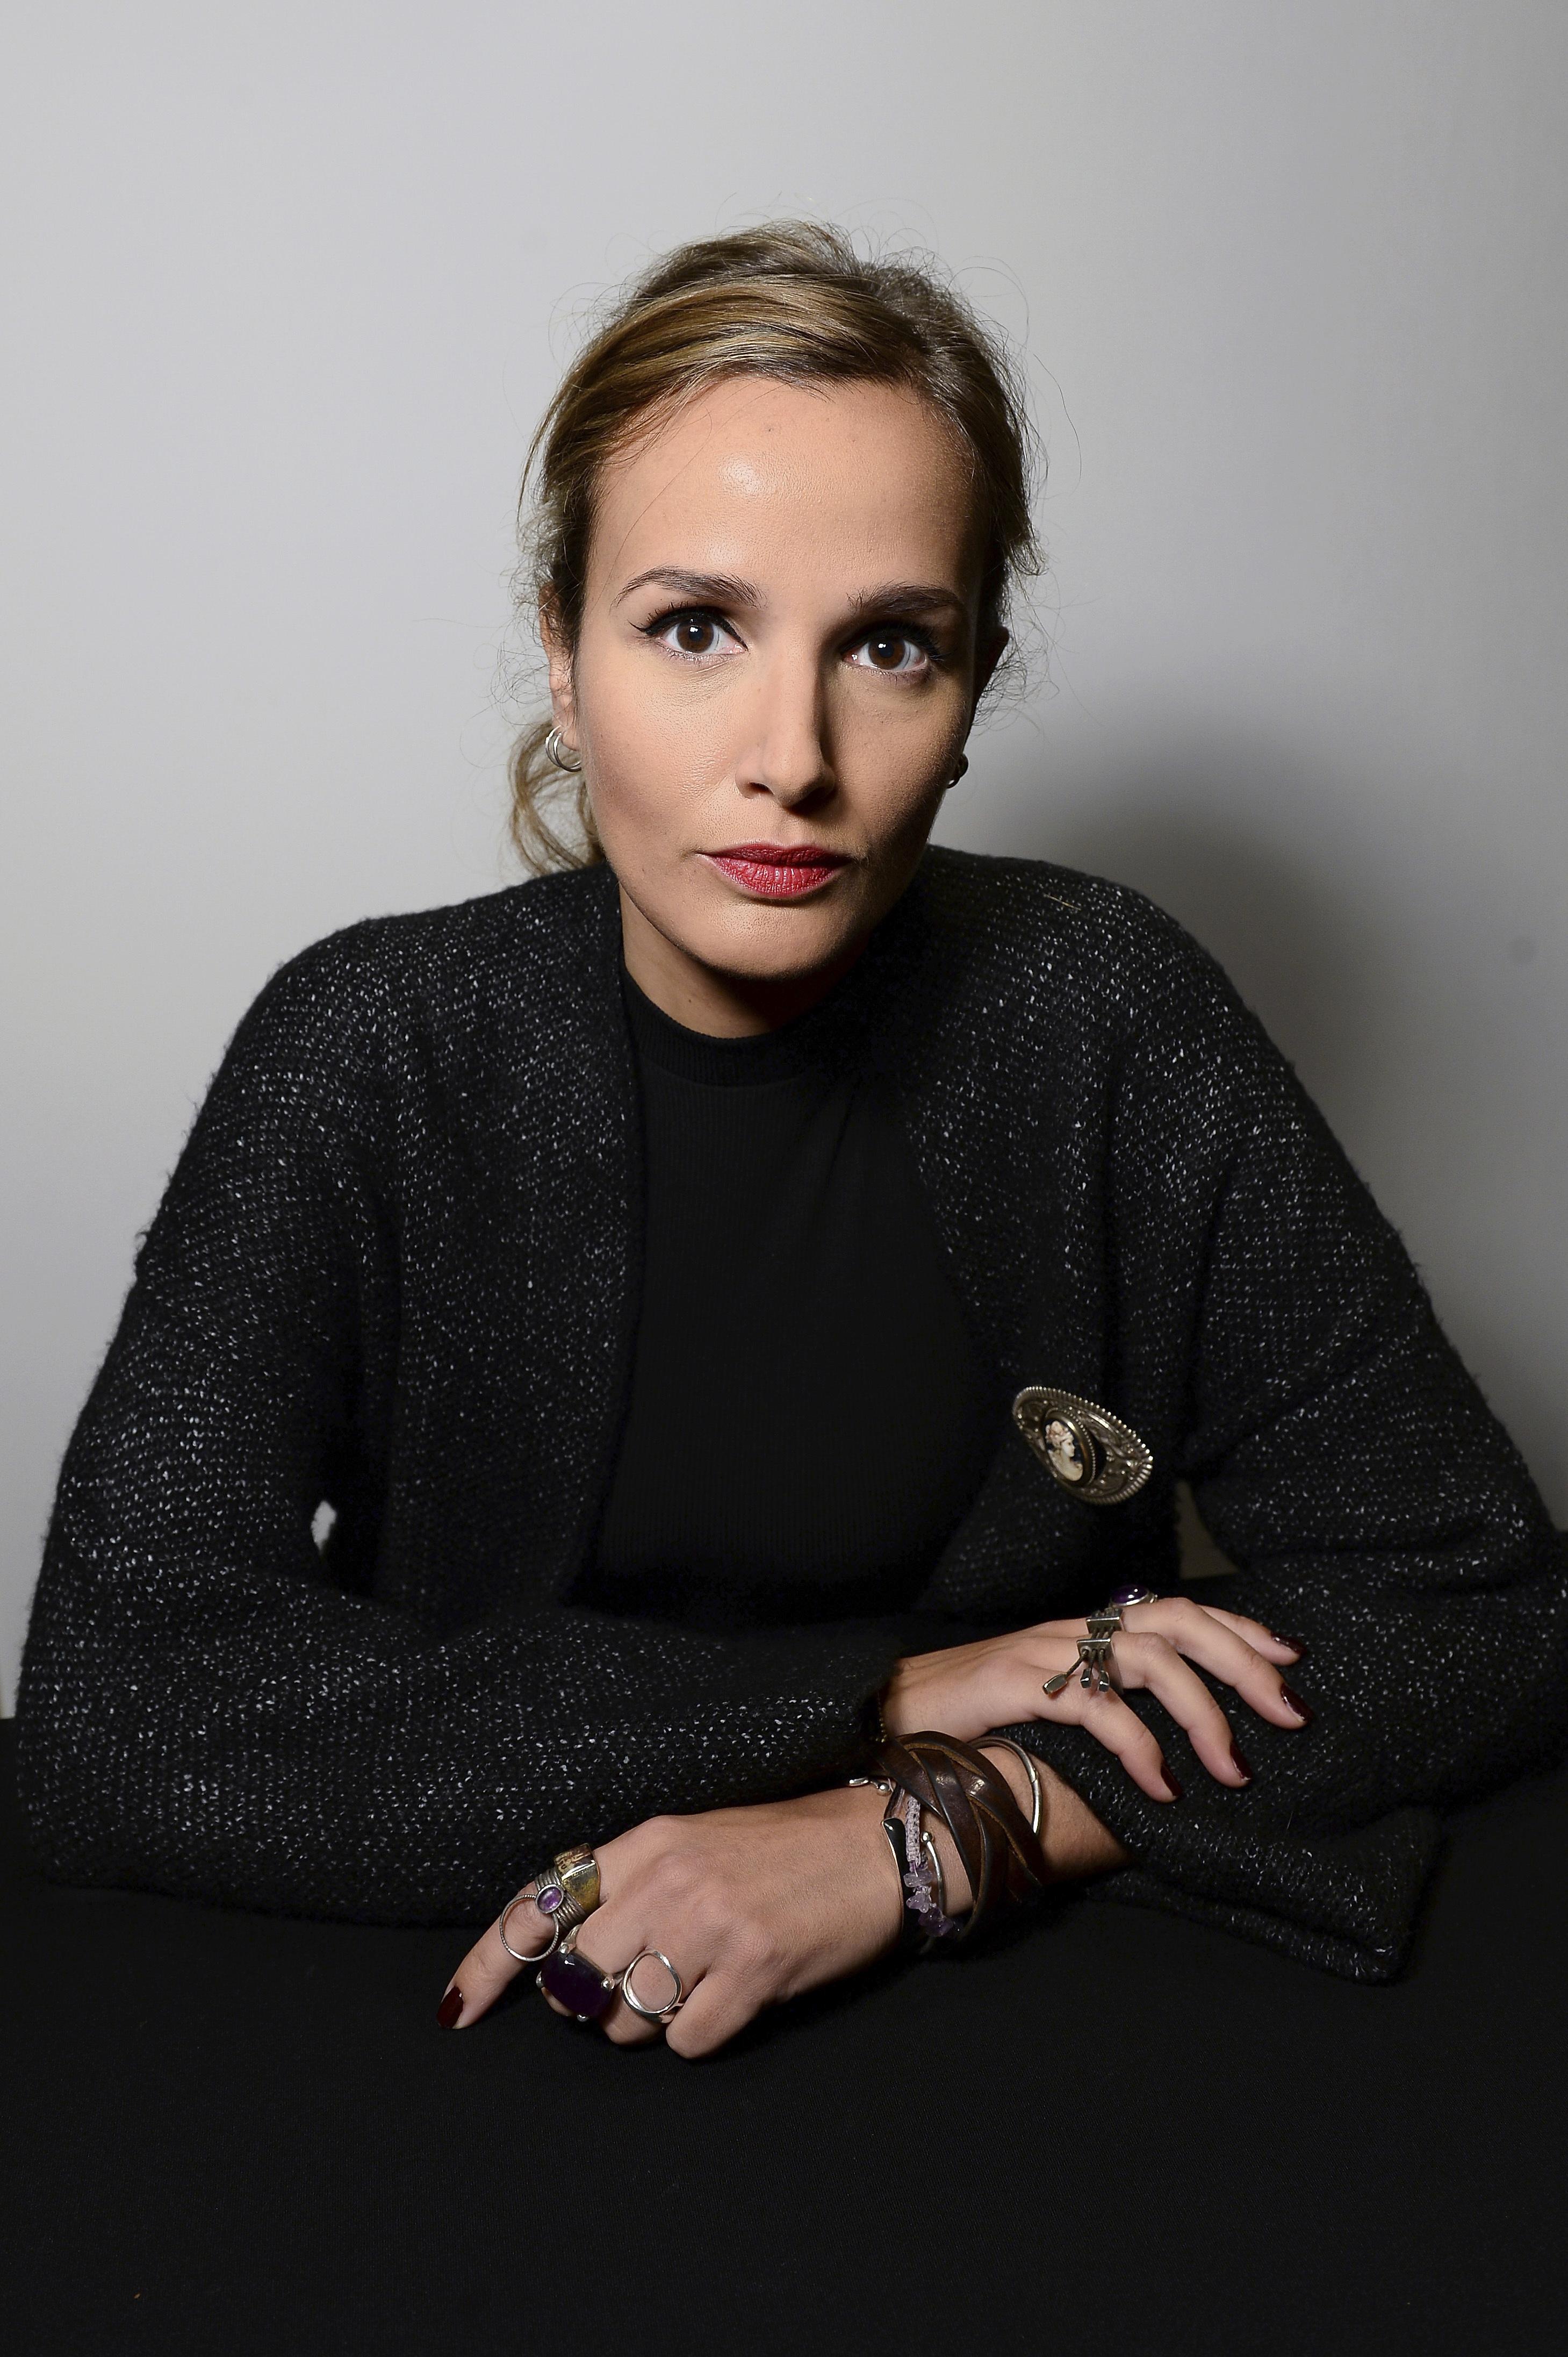 Julia Ducournau